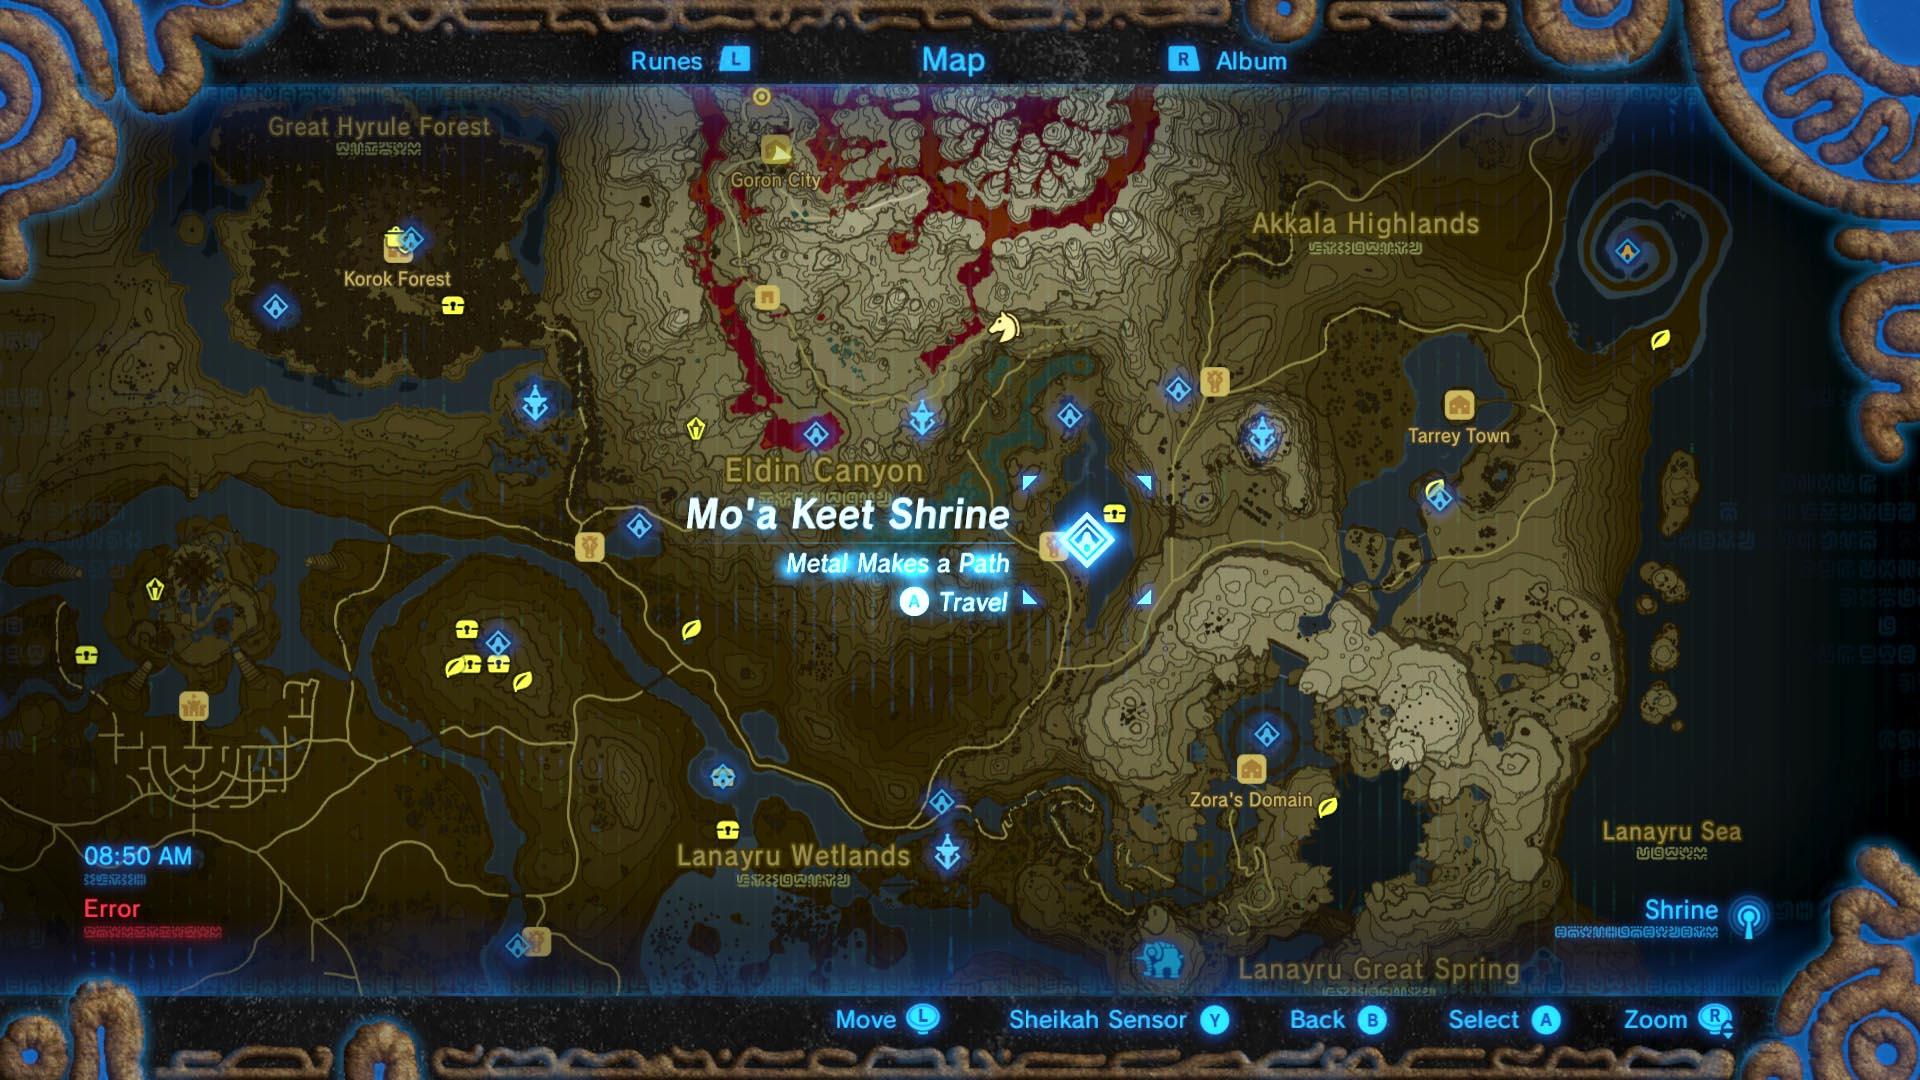 Zelda: Breath of the Wild guide: Mo'a Keet shrine location